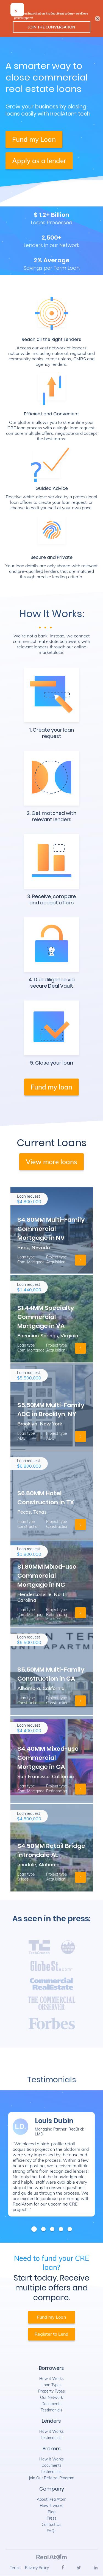 Example of Design for Finance, Credit & Lending, Loans, Mobile Landing Page by realatom.com | Mobile Landing Page Design